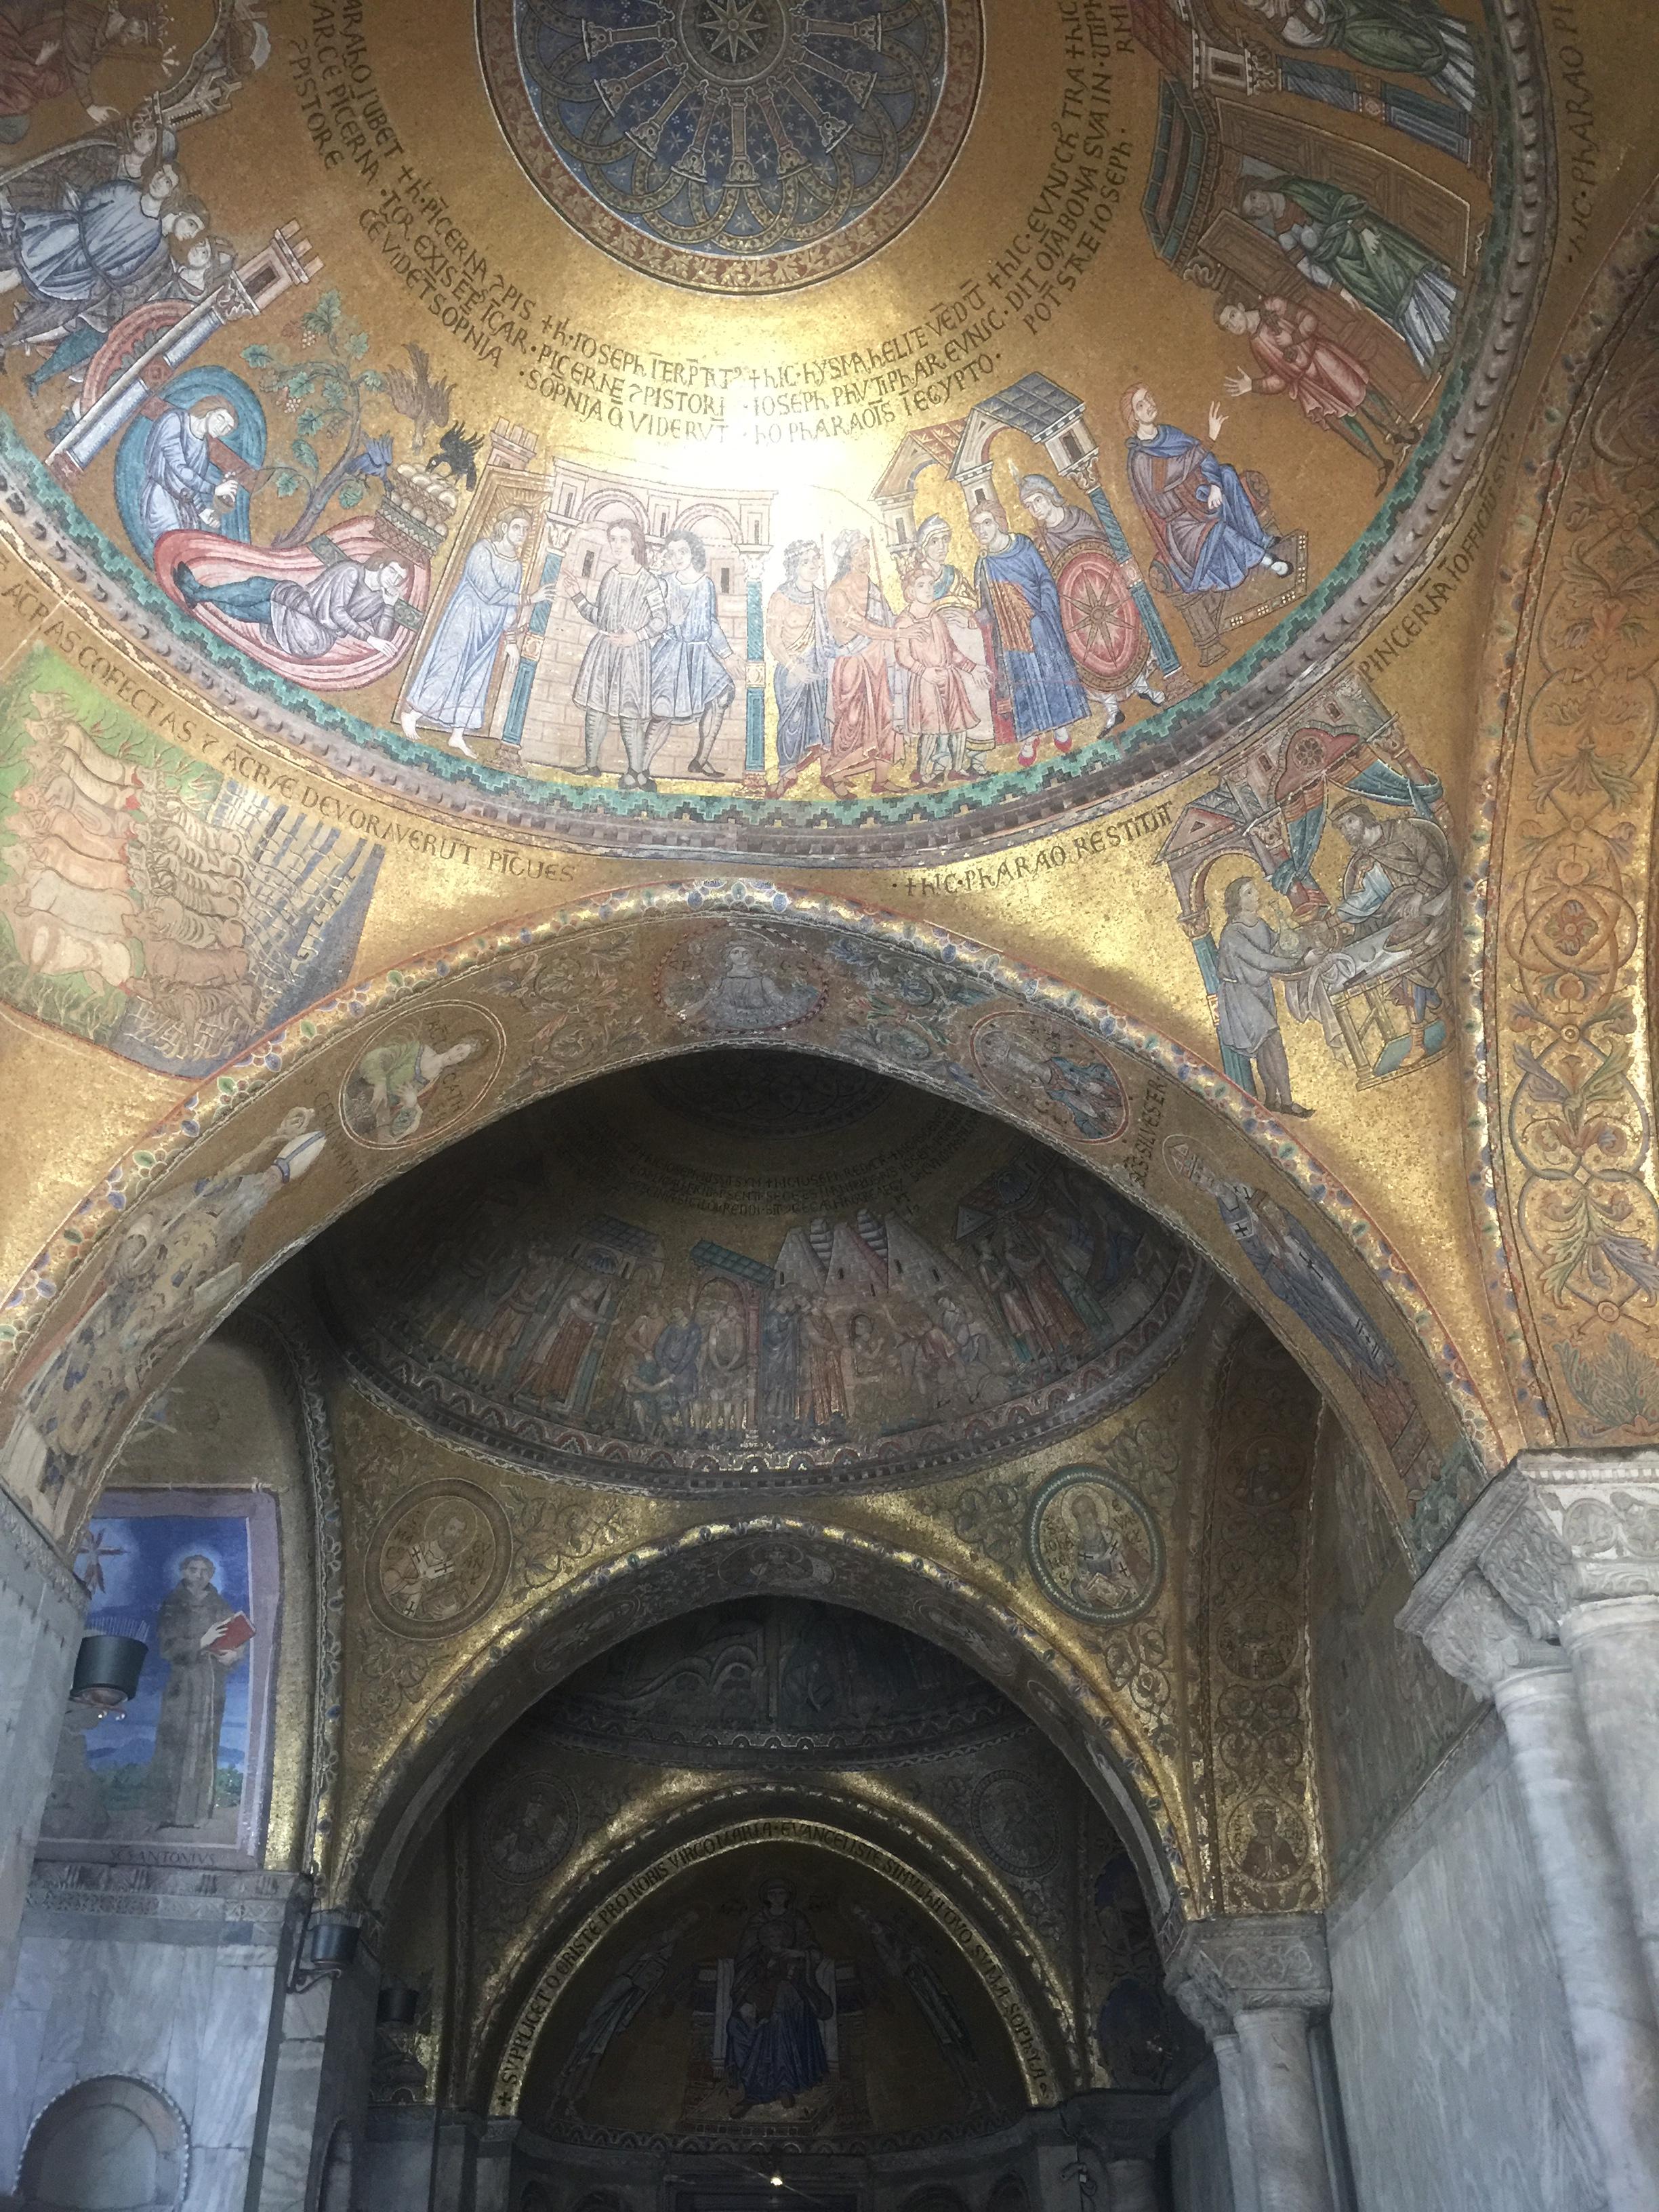 Interiors of the Basilica di San Marco